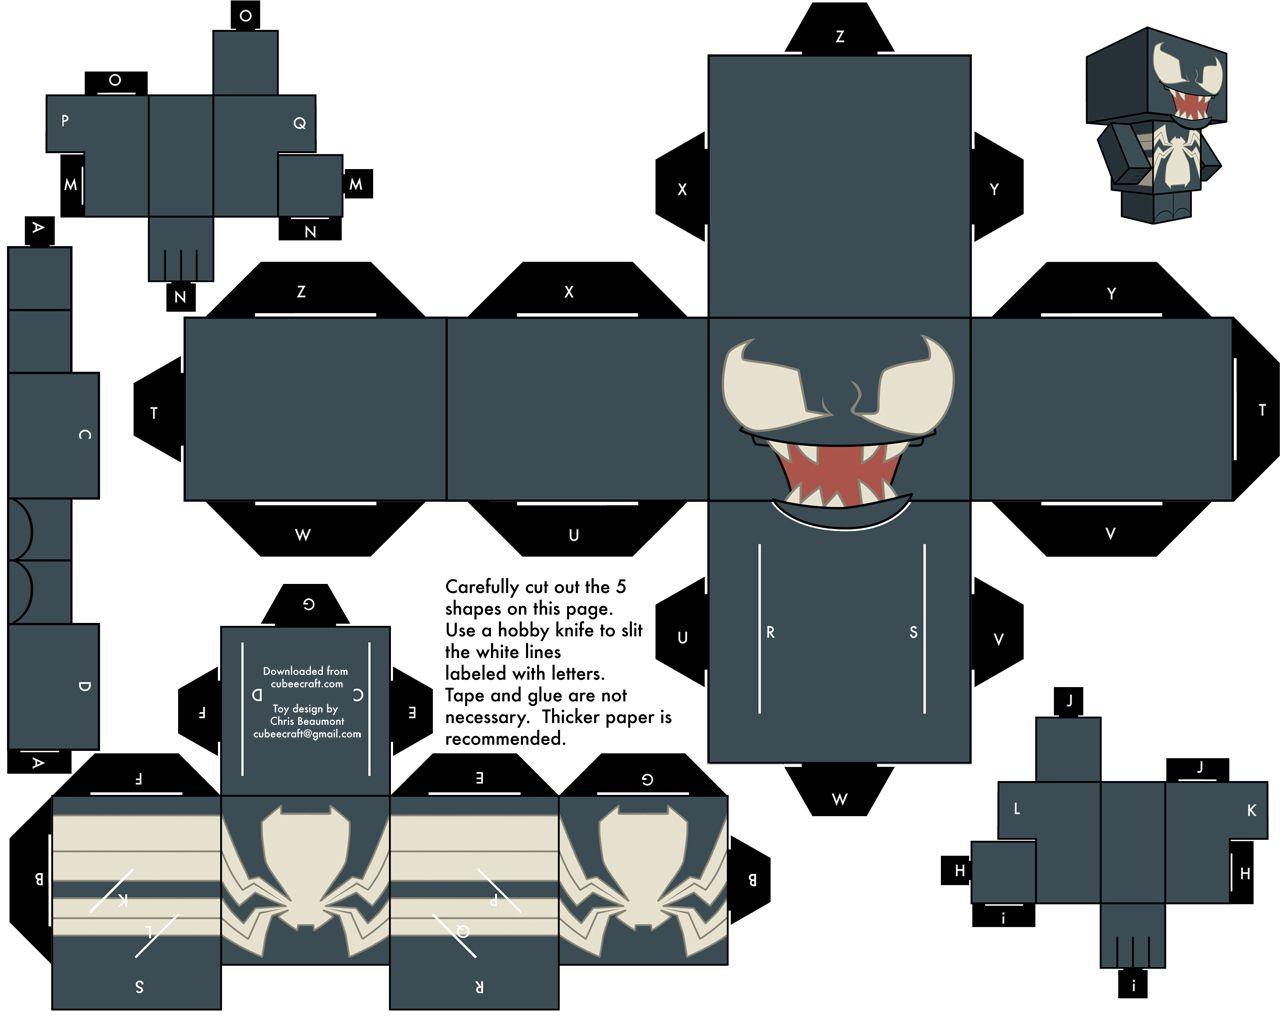 Paper craft casero Miku Hatsune Cubecraft, Manualidades